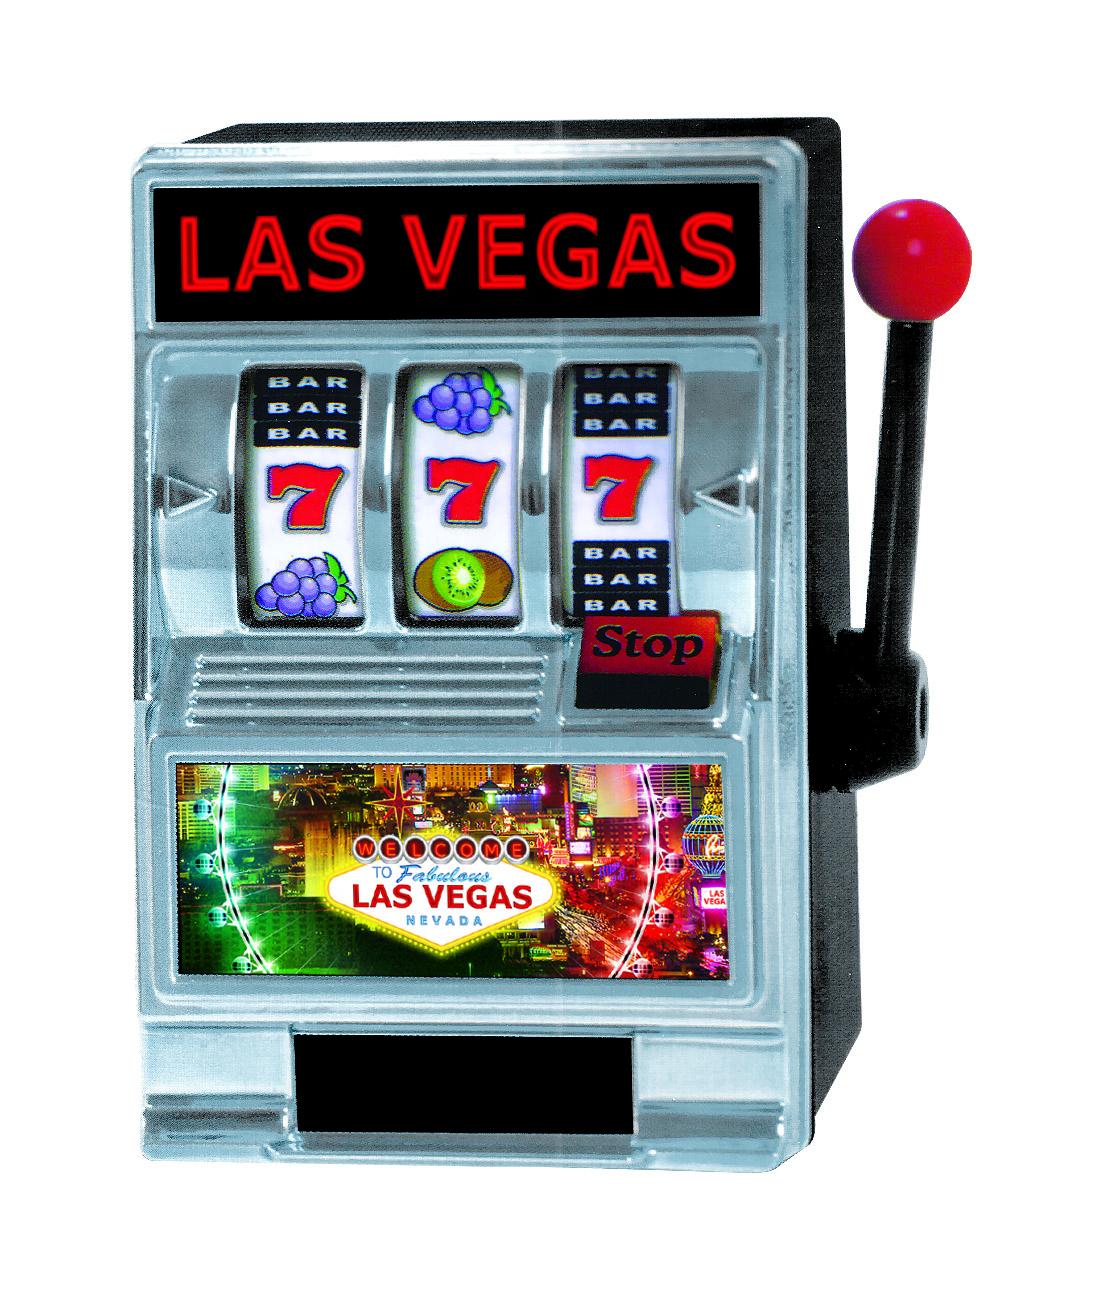 Slot machine money bank internet gambling business for sale